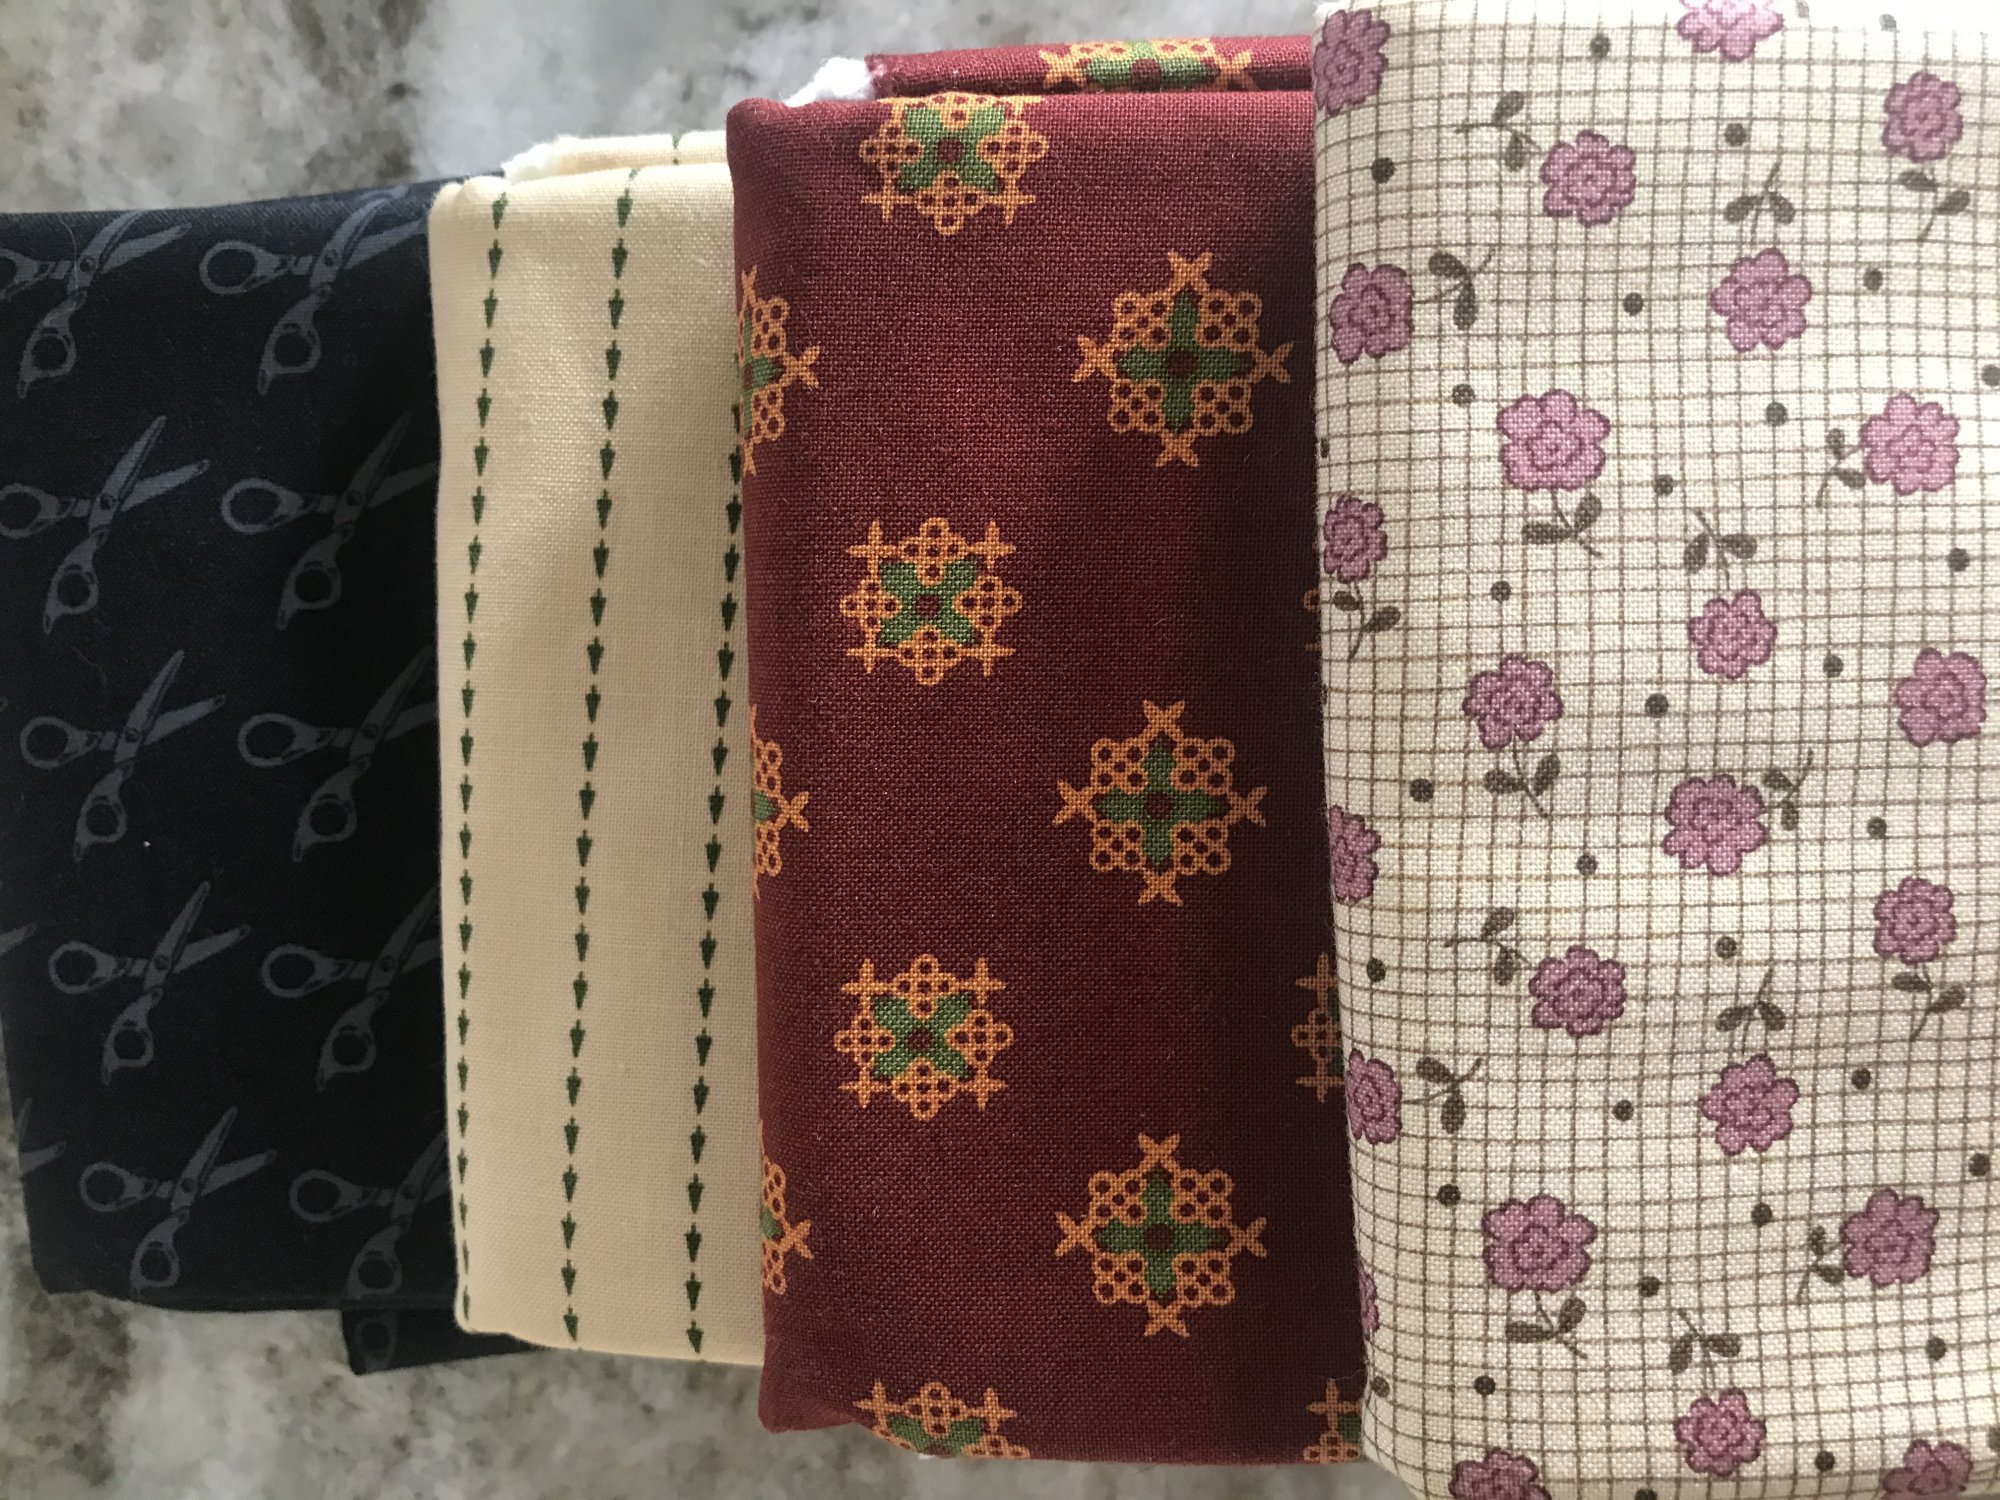 6-C 4 Moda Fabrics One Yard Cuts